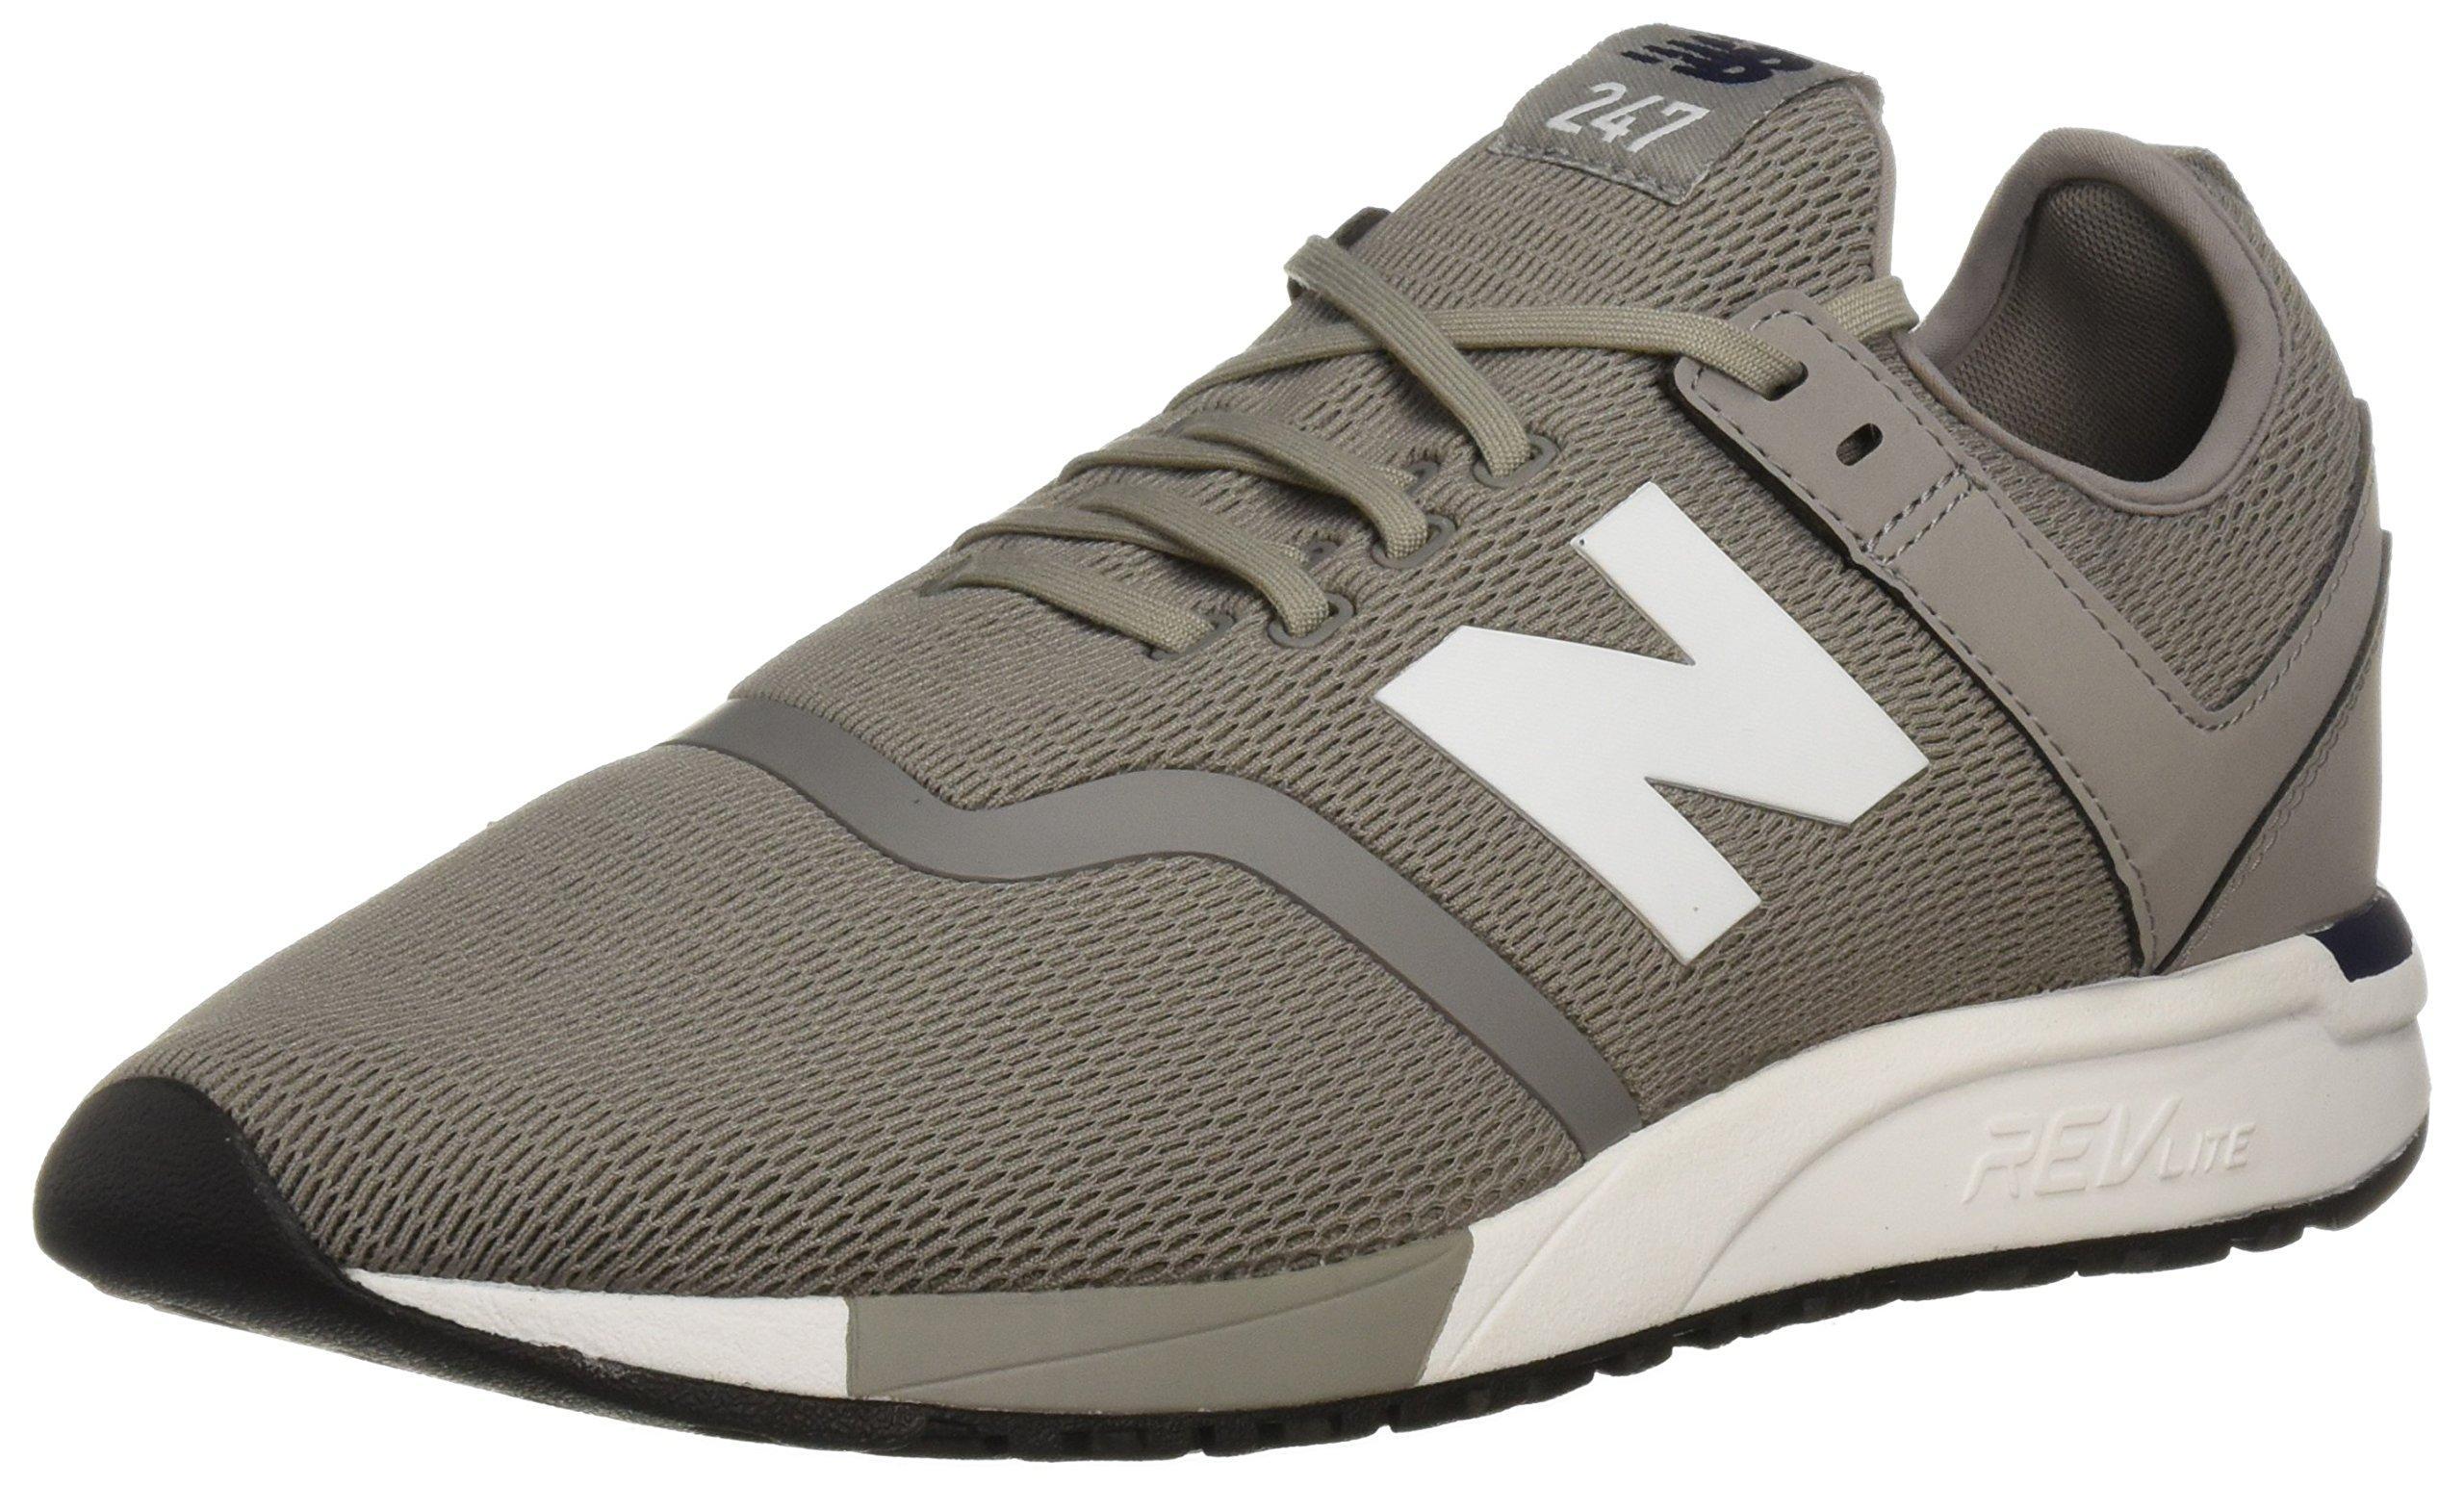 New Balance Mrl247d1 in Gray for Men - Lyst